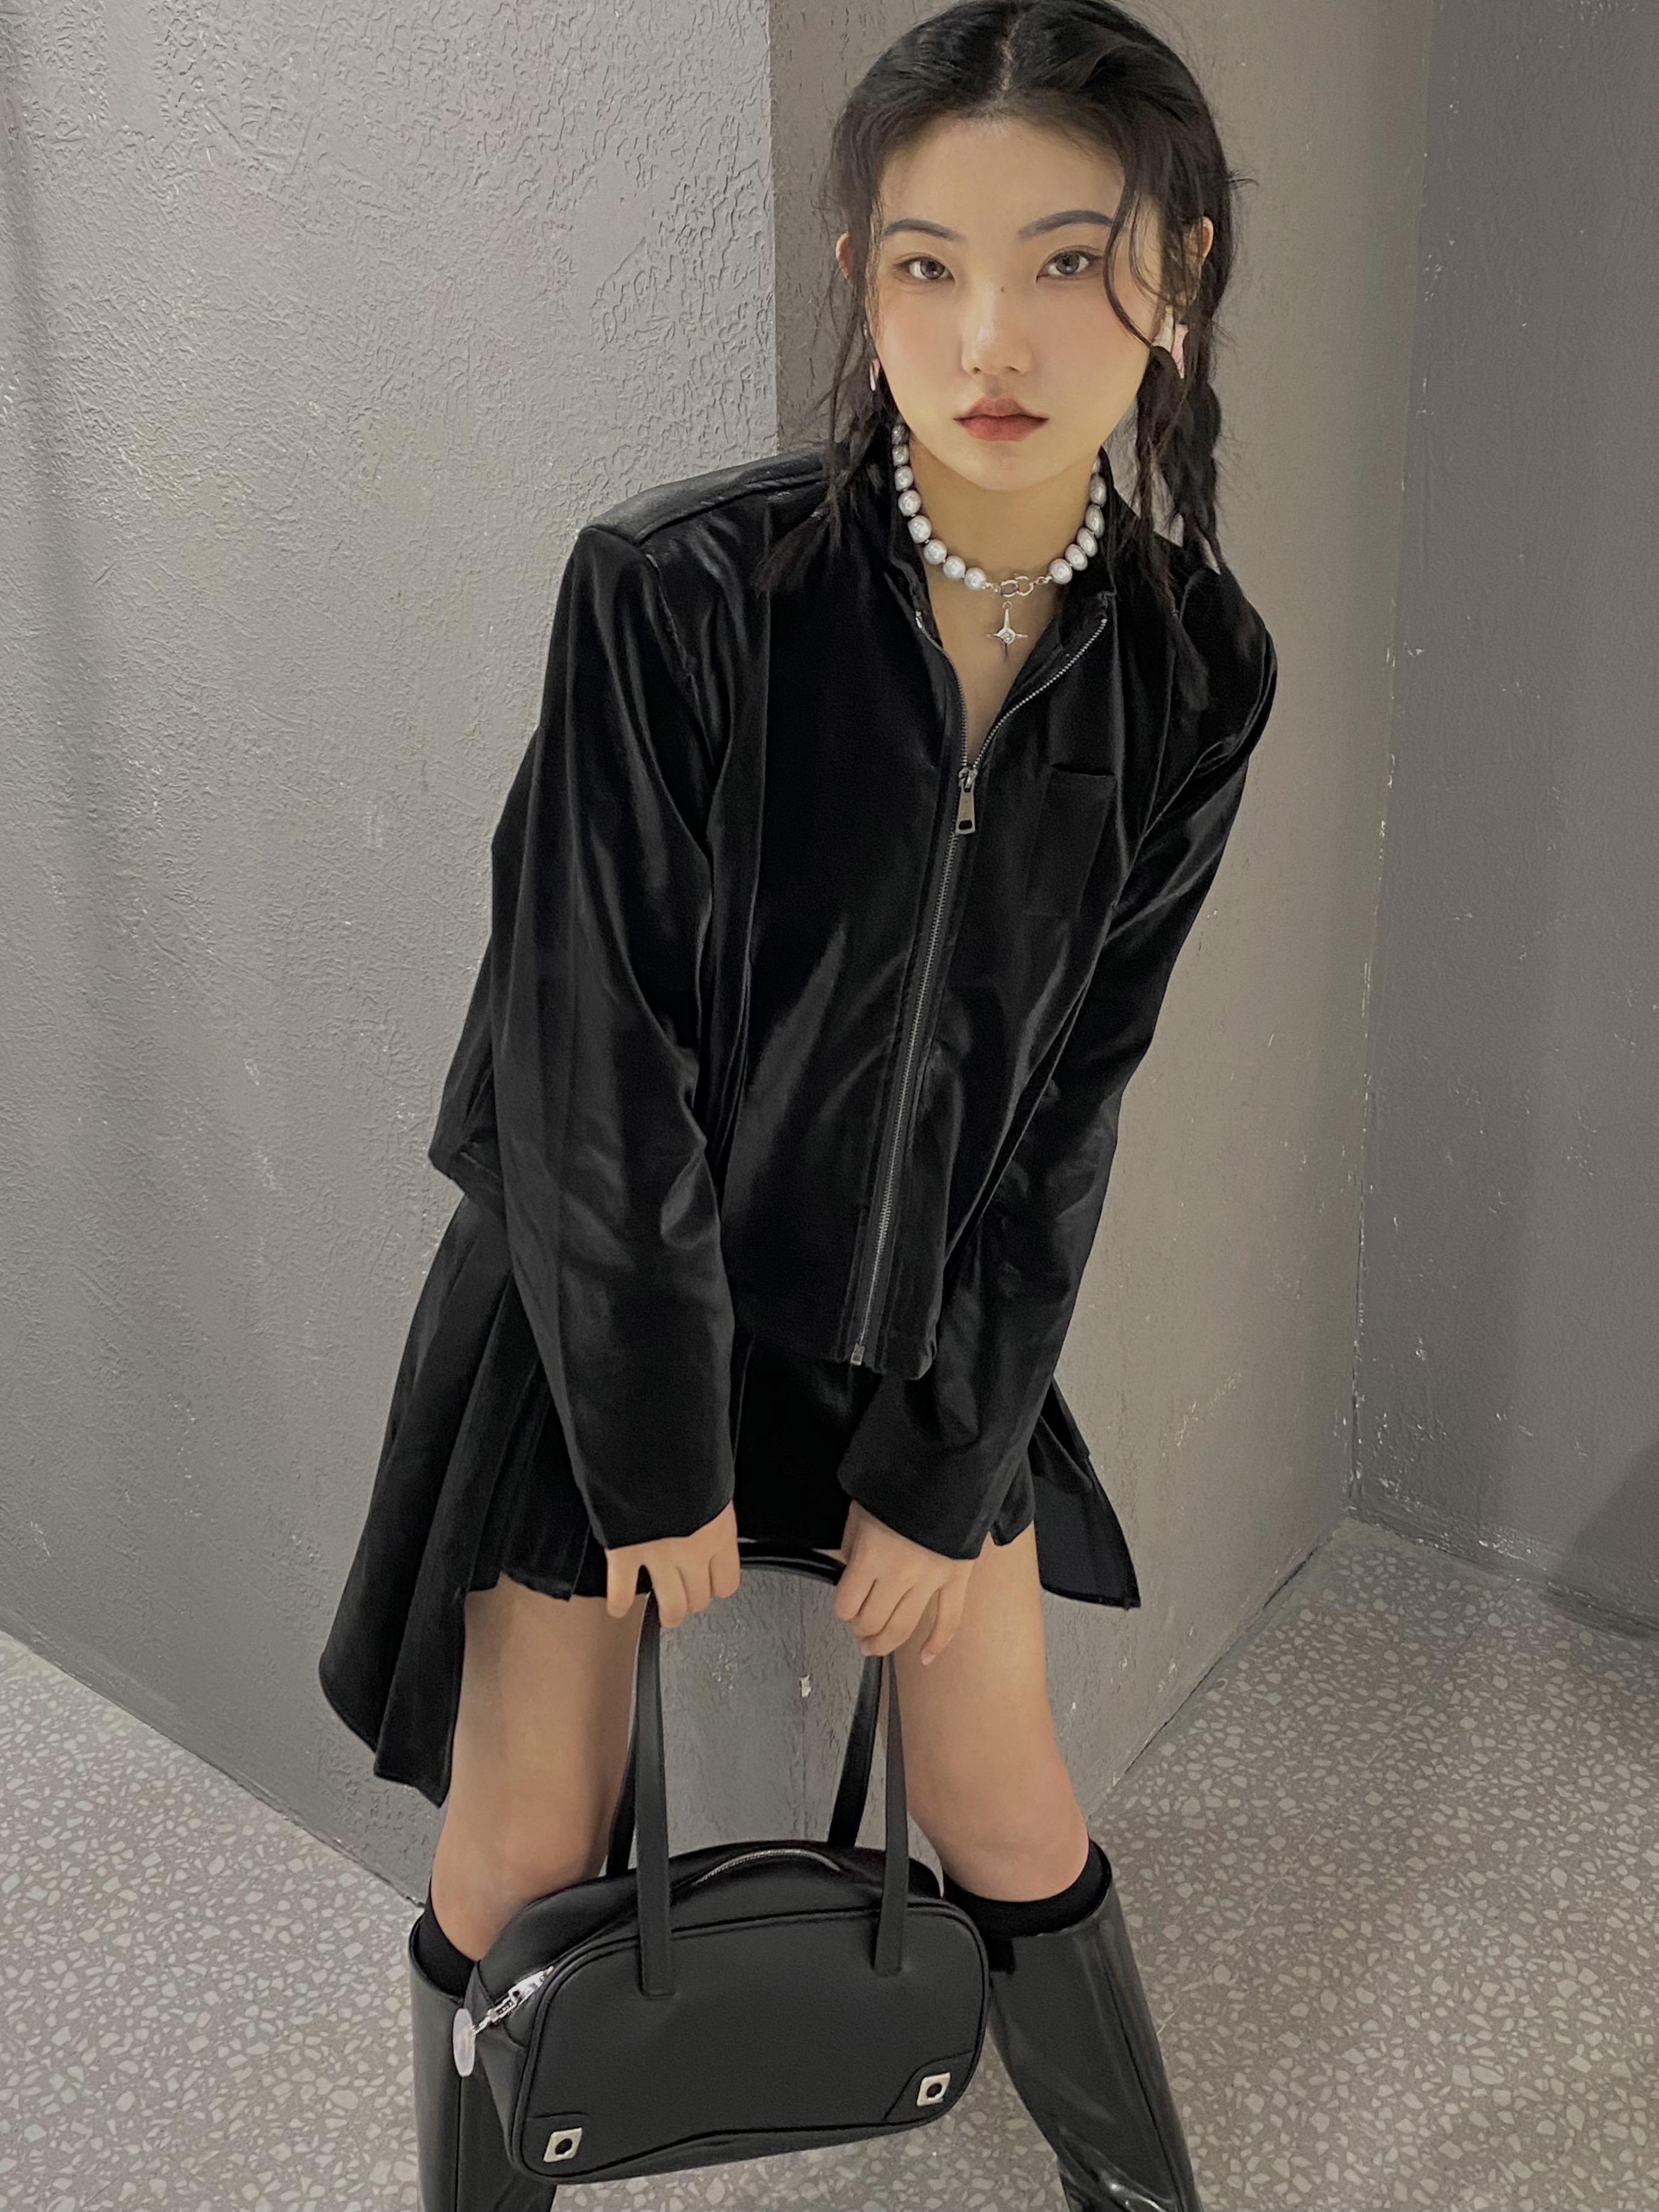 CHILLIPUSS原创设计丝绒光感纹理皮衣外套女春季新款款宽松夹克薄